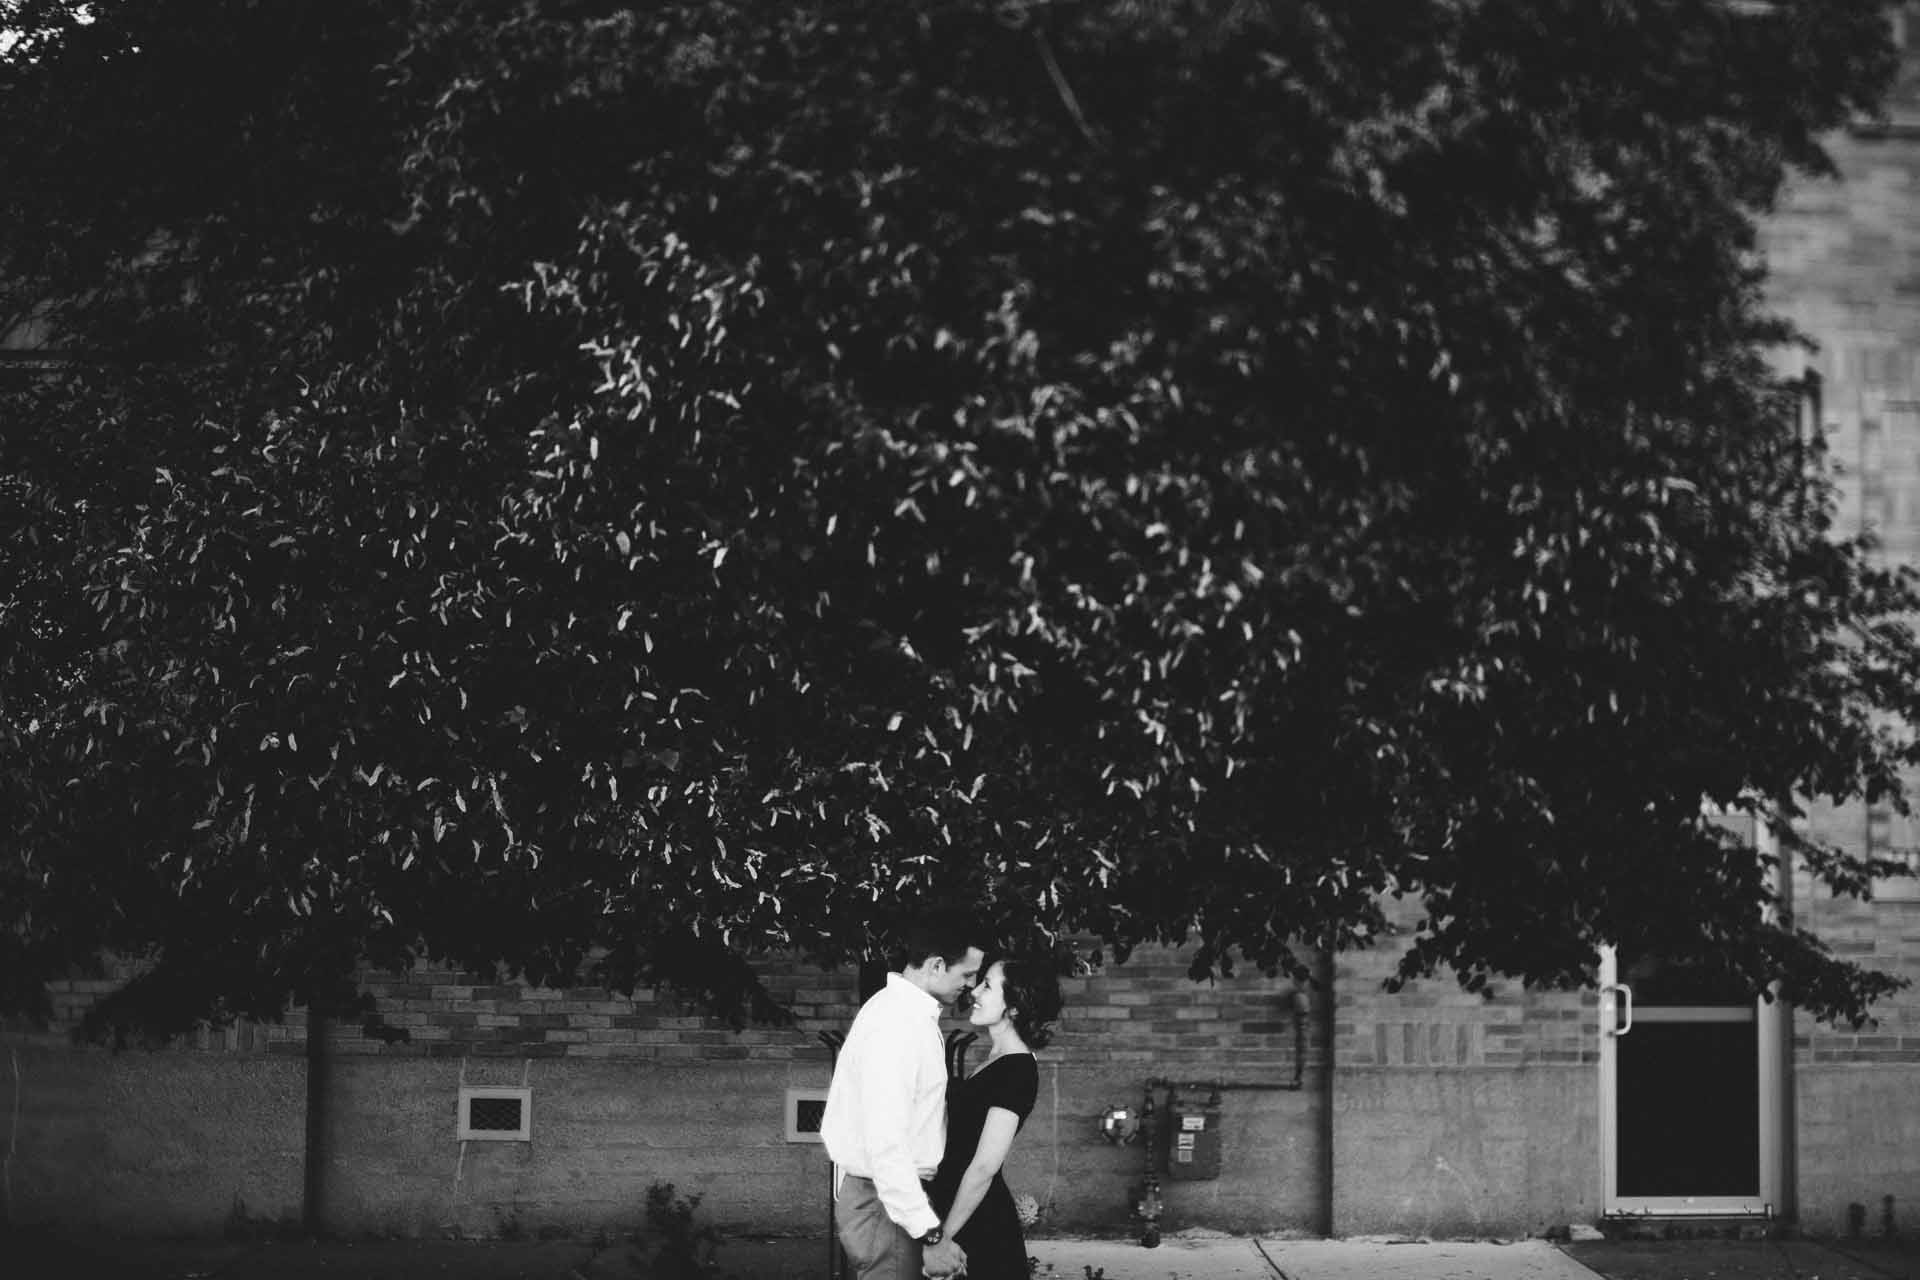 Emily-Dan-Dayton-Engagement-023@2x.jpg